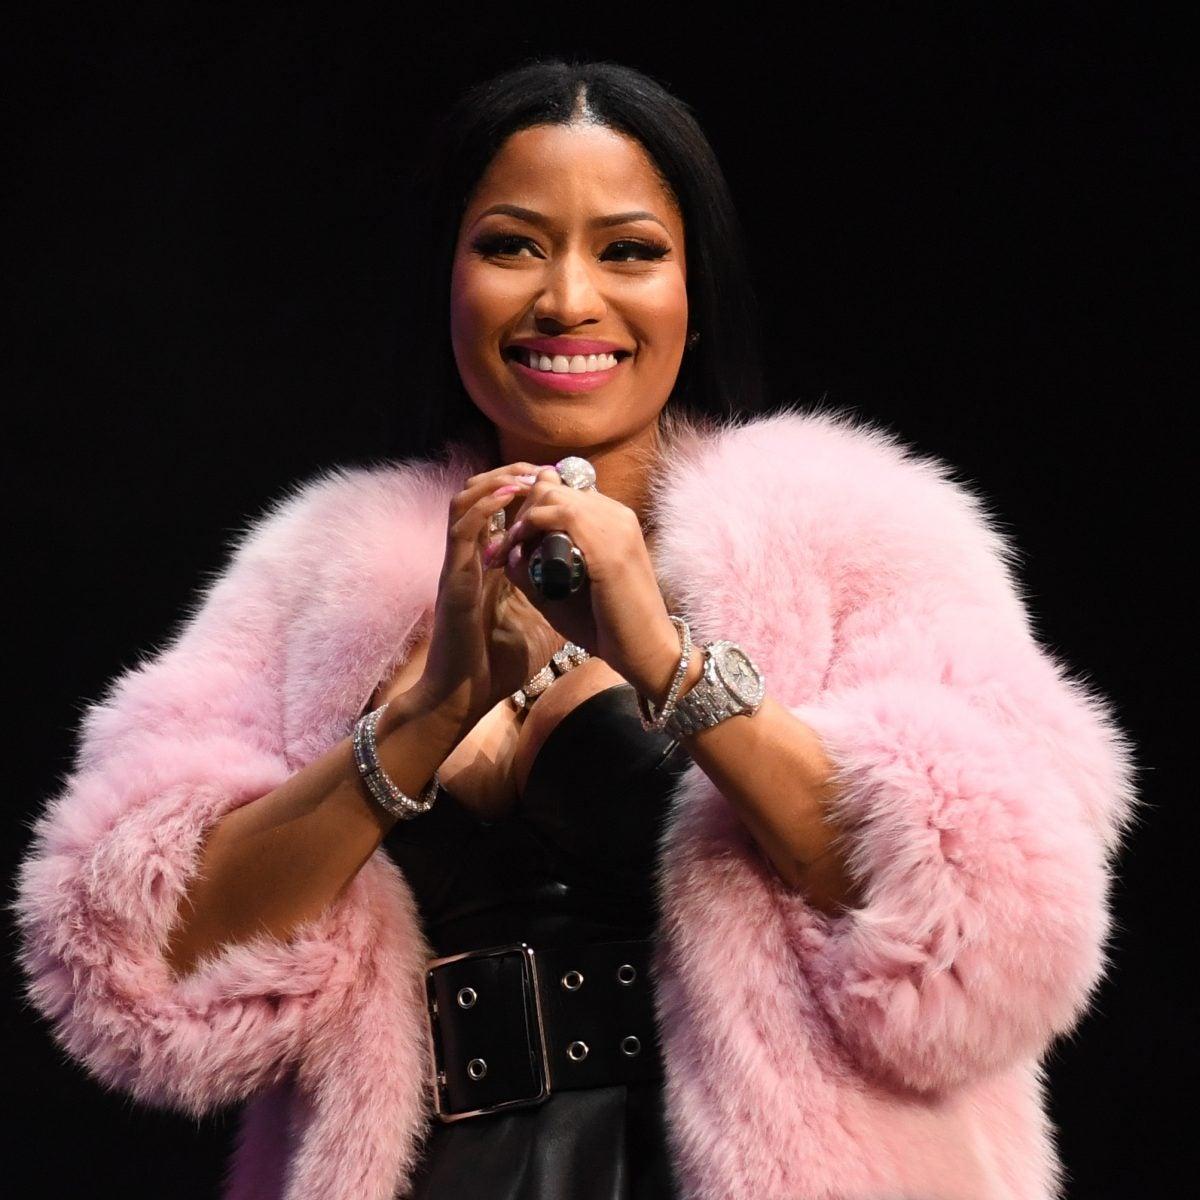 See The First Photos Of Nicki Minaj's Precious Baby Boy